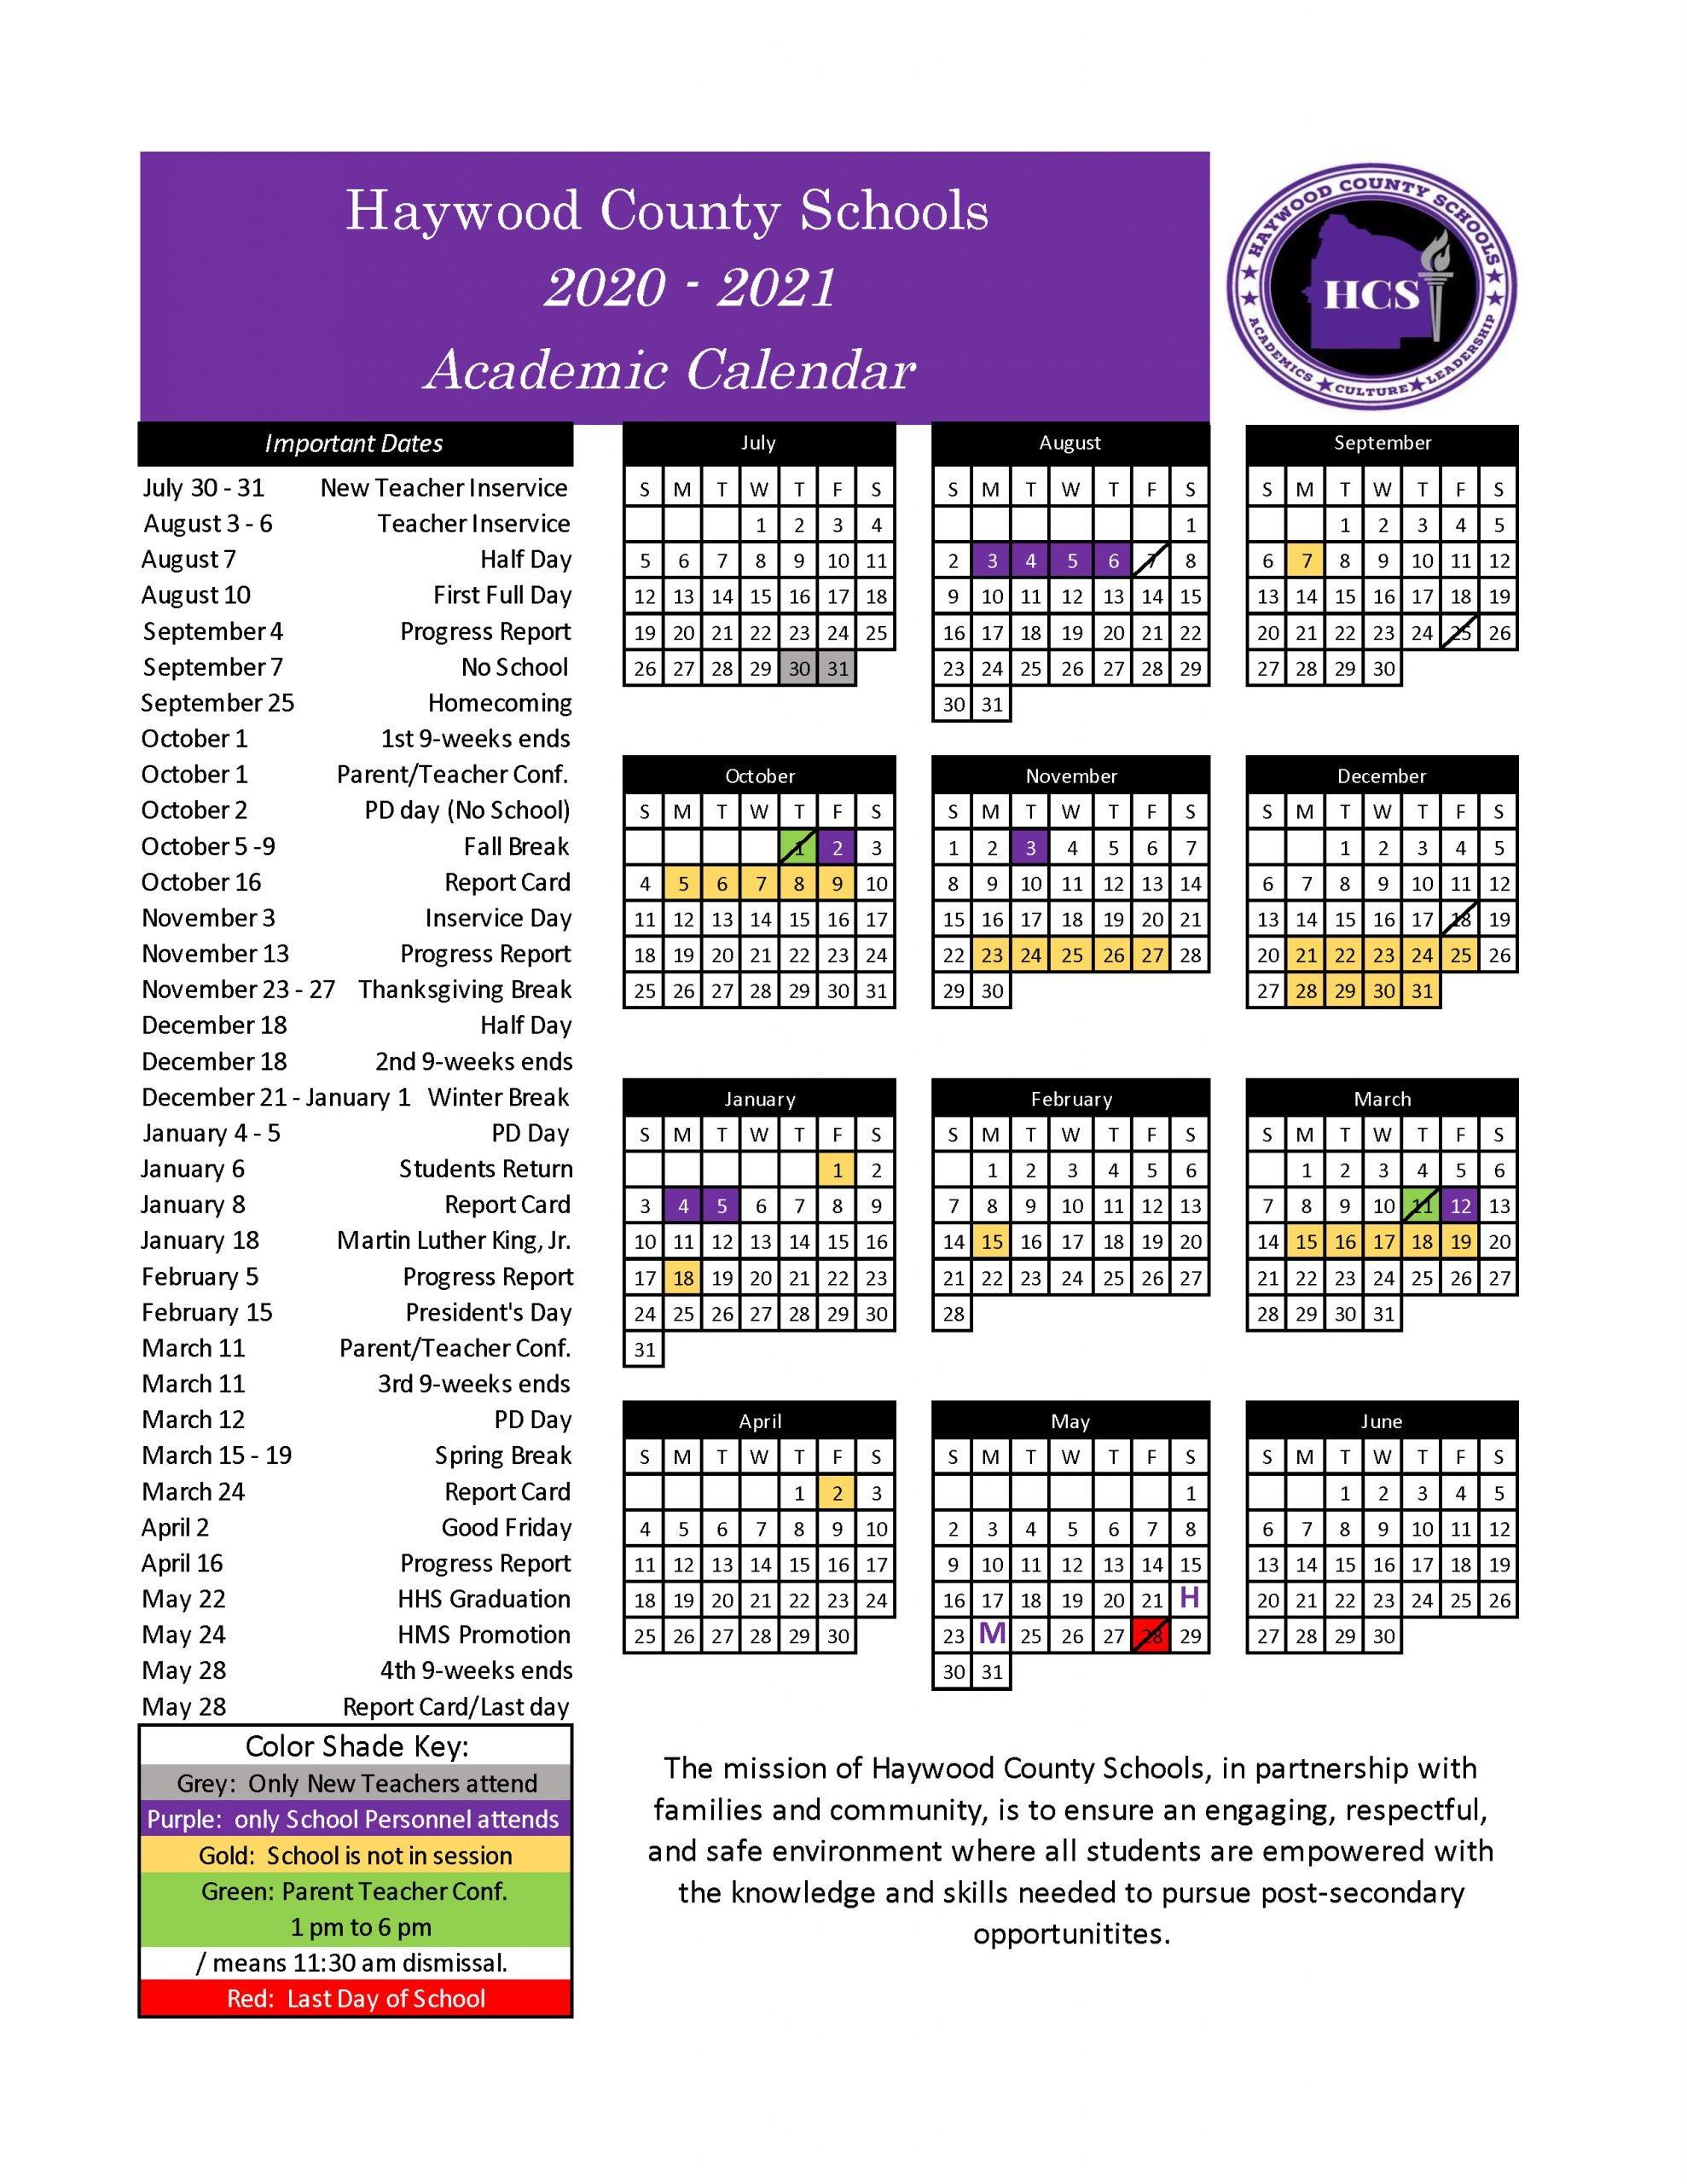 School Calendar | Haywood County Schools With Hayward Unified School District Calendar 2021